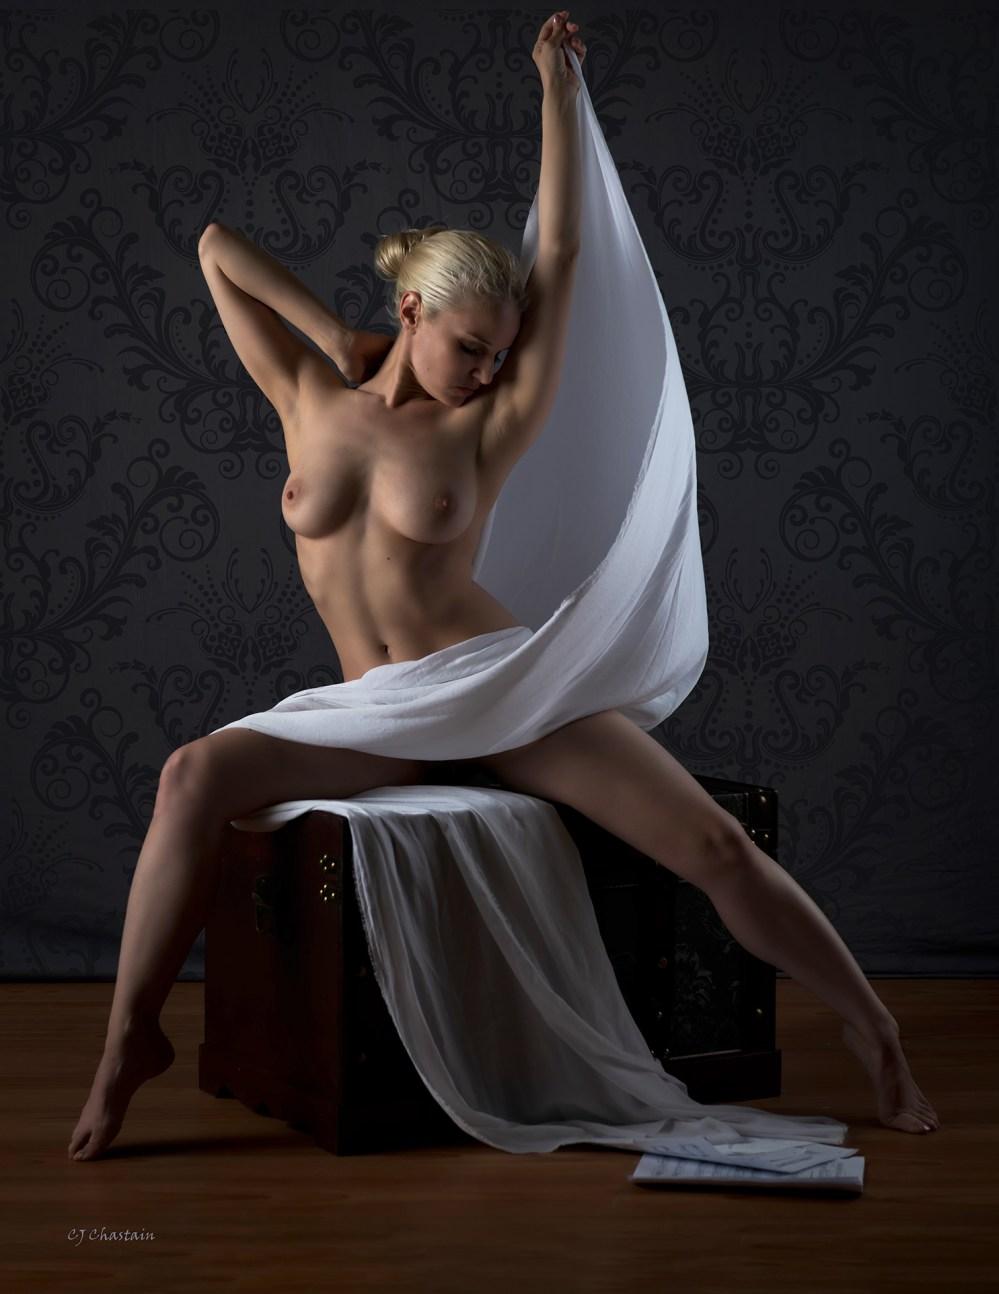 2019 Liz Ashley by photographer Clint Chastain